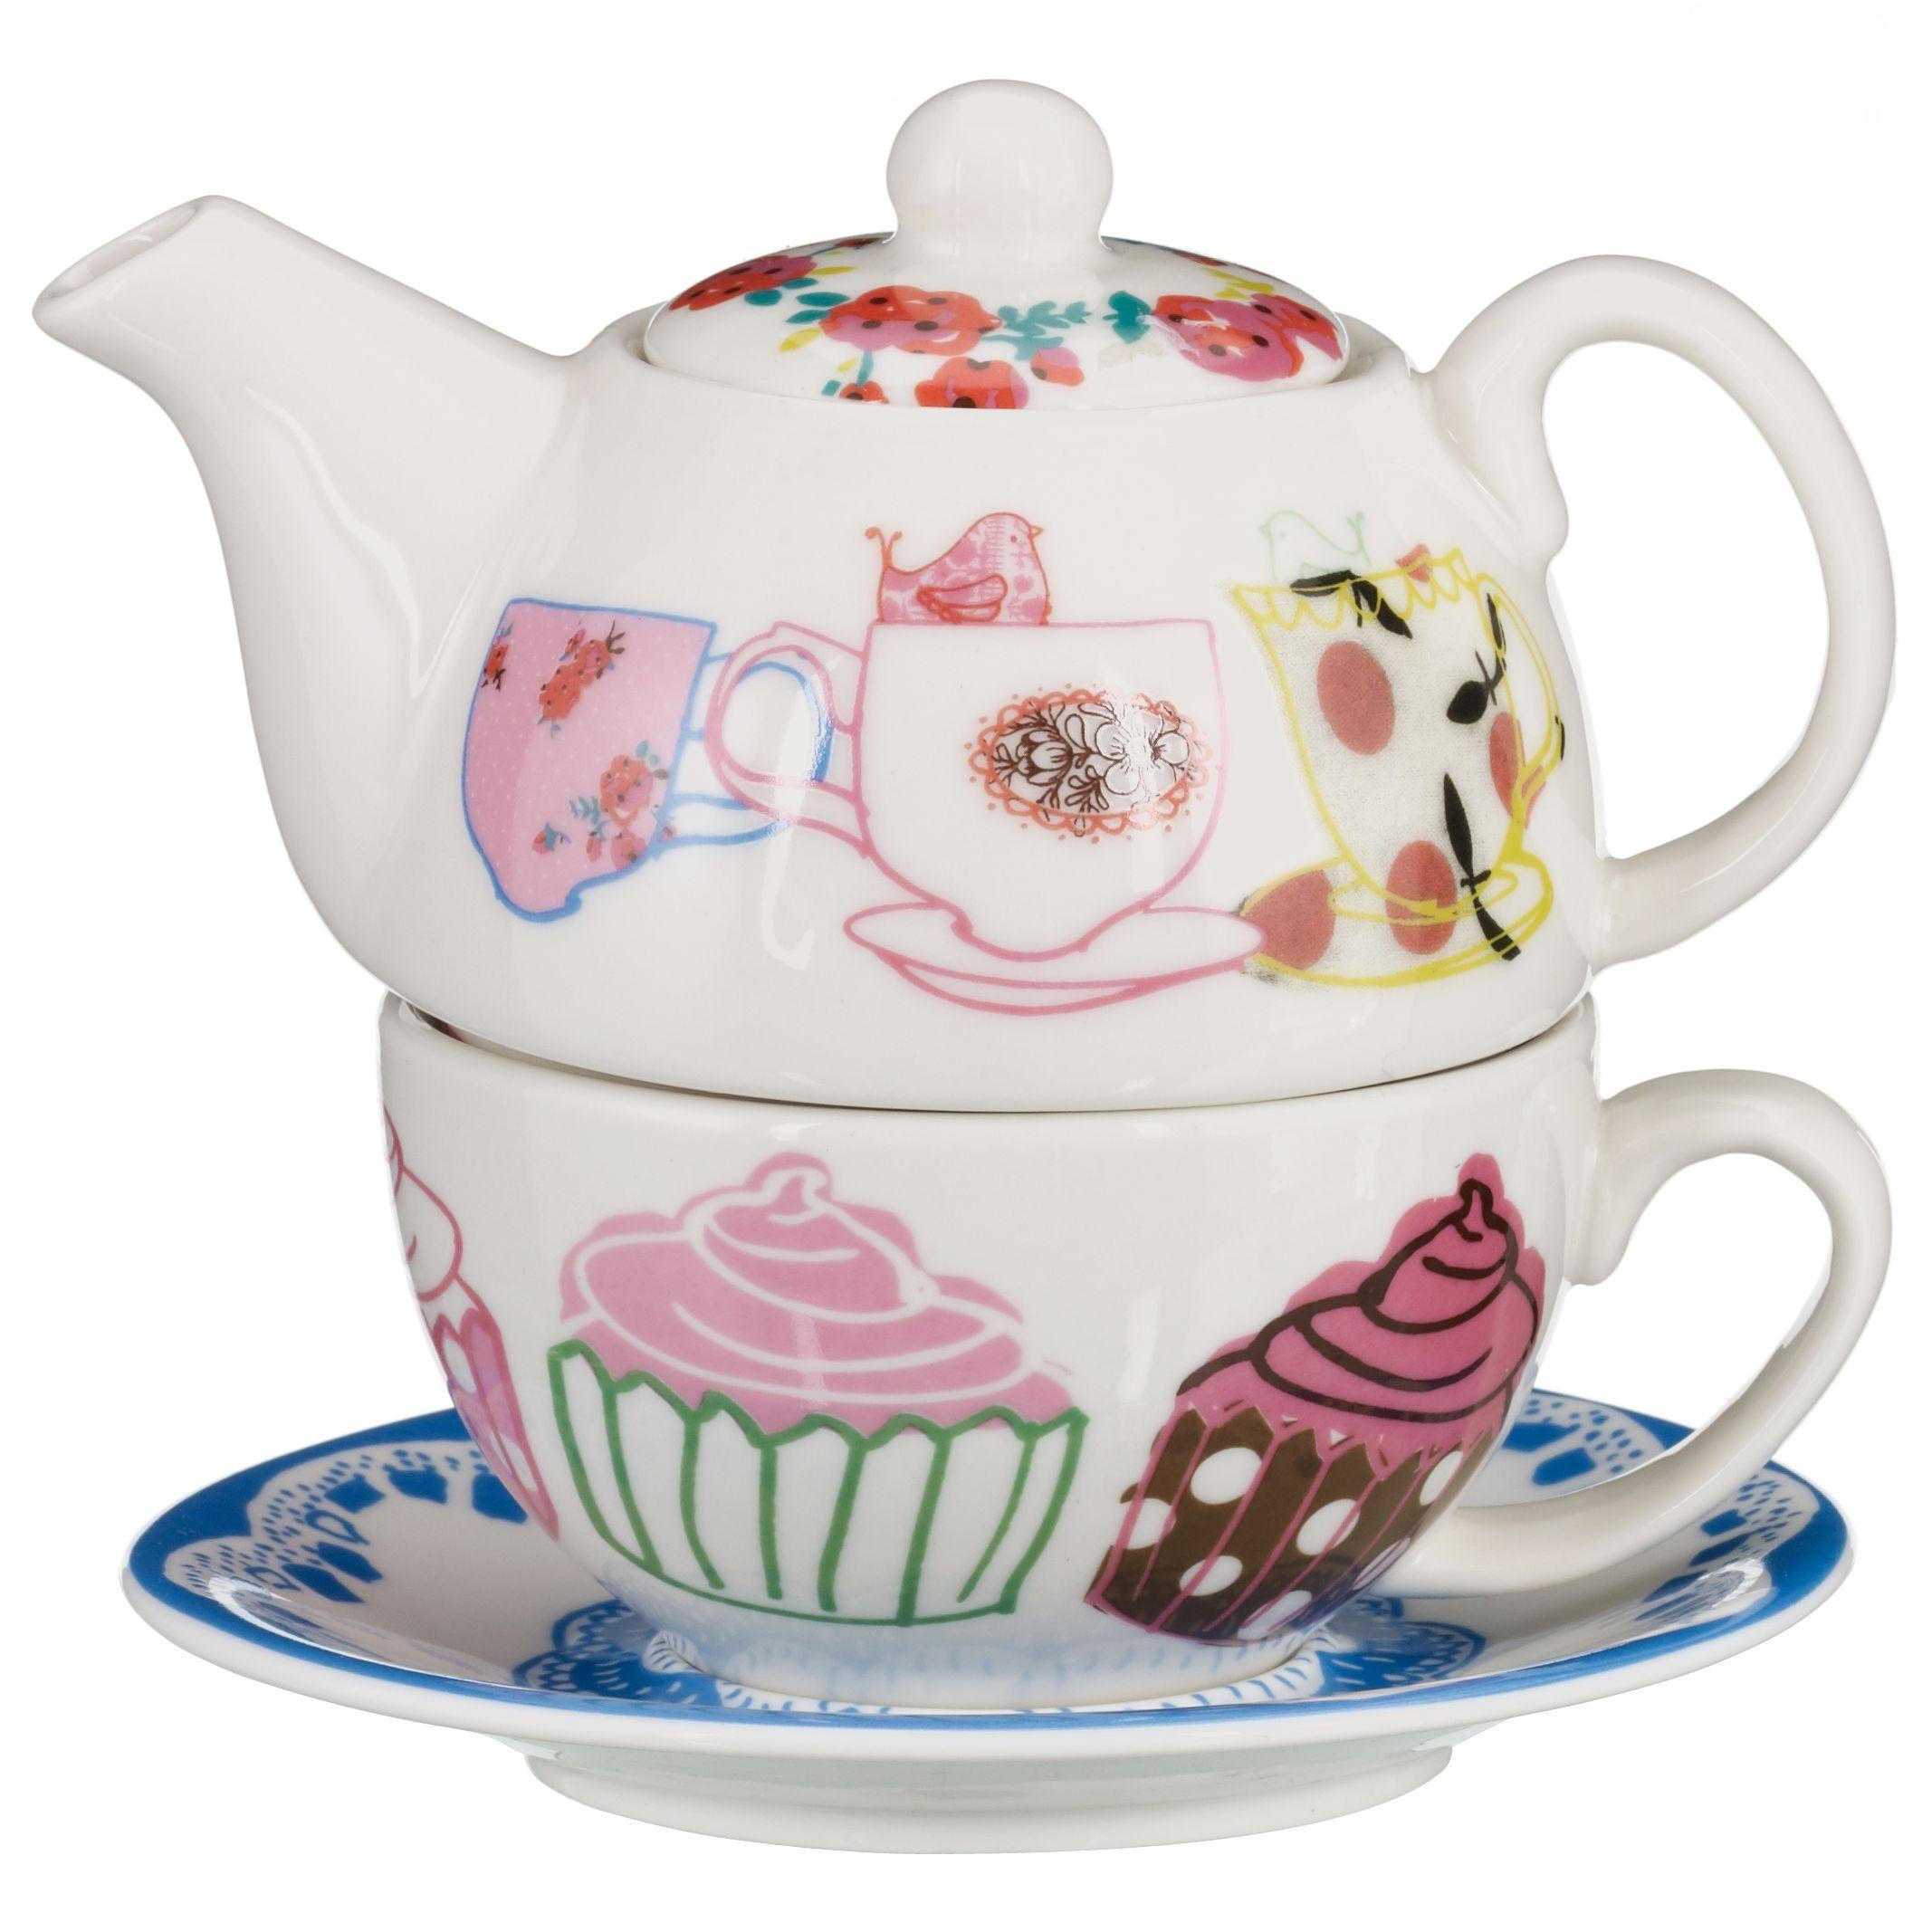 Flutters & Fancies Tea Set